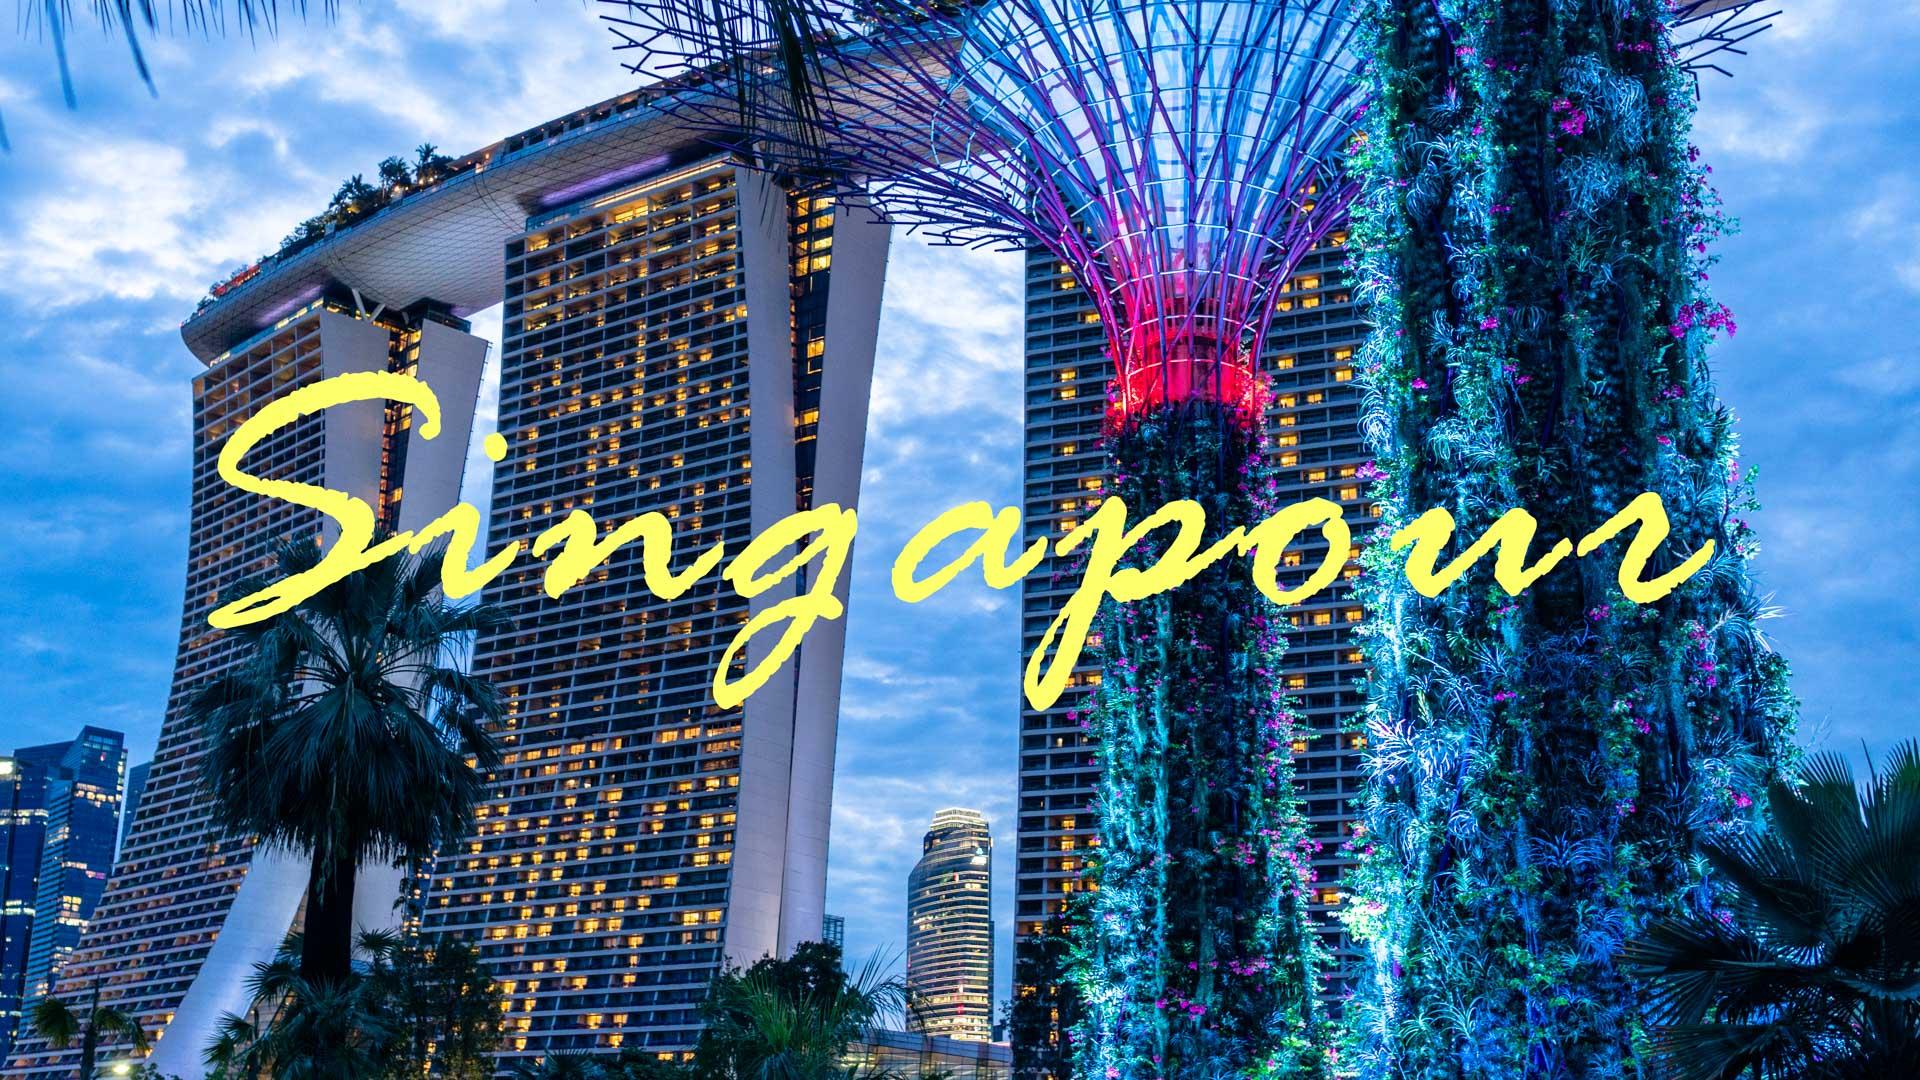 SerialHikers stop autostop world monde tour hitchhiking aventure adventure alternative travel voyage sans avion no fly singapour singapore destination marina bay gardens guide